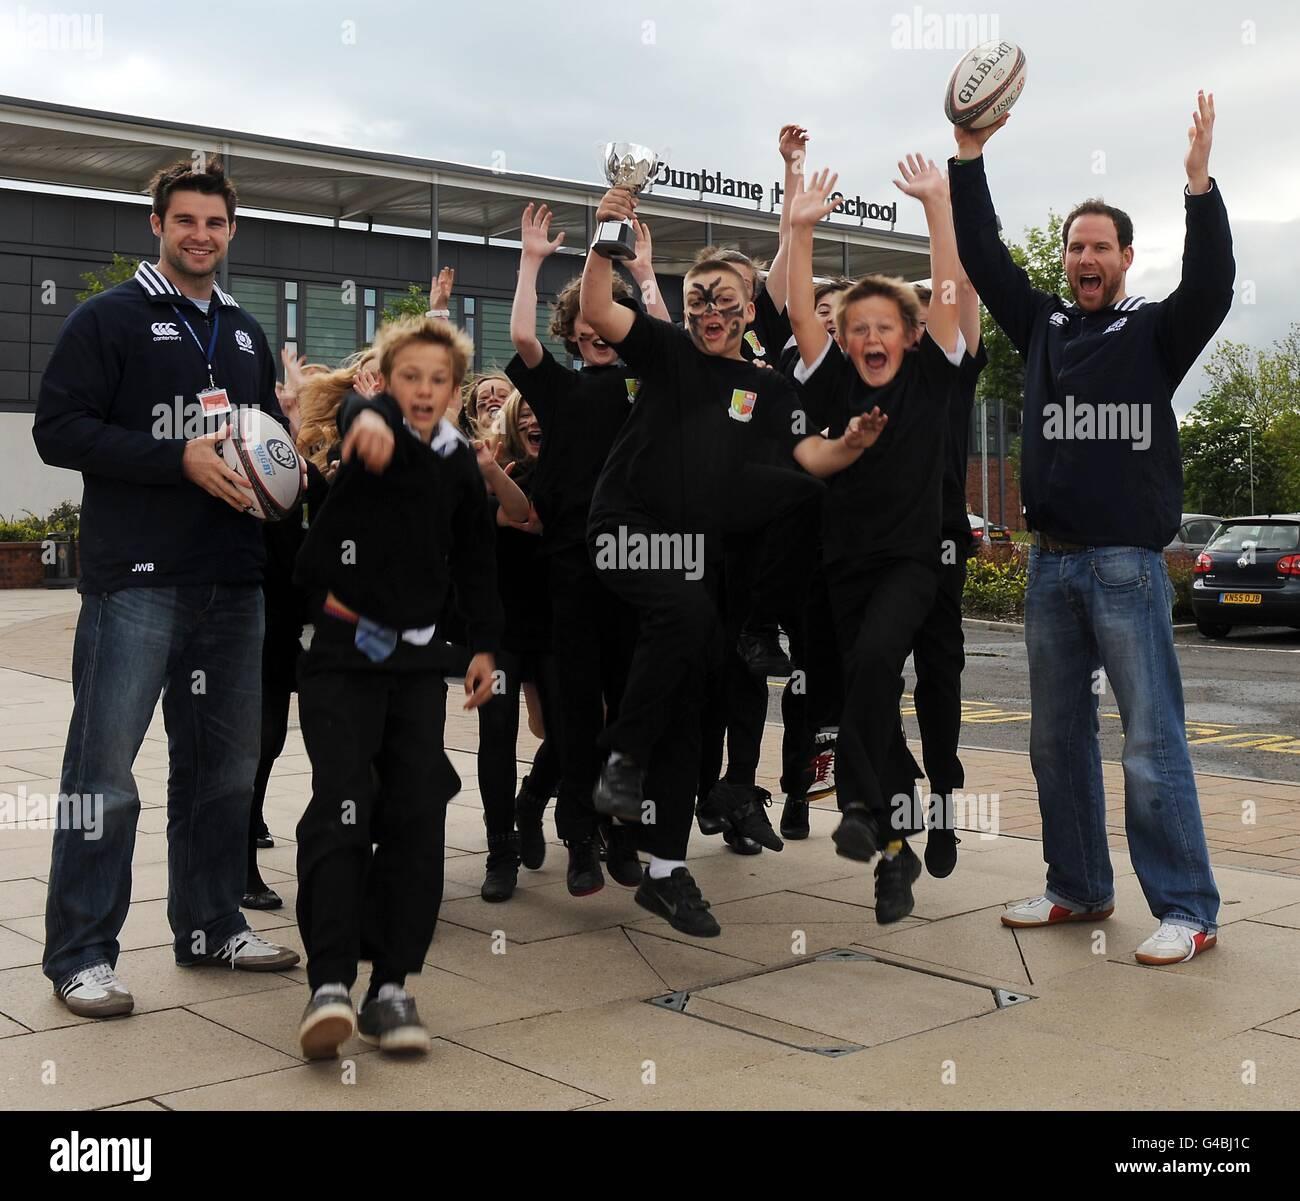 School Shooting Britain: Dunblane School Stock Photos & Dunblane School Stock